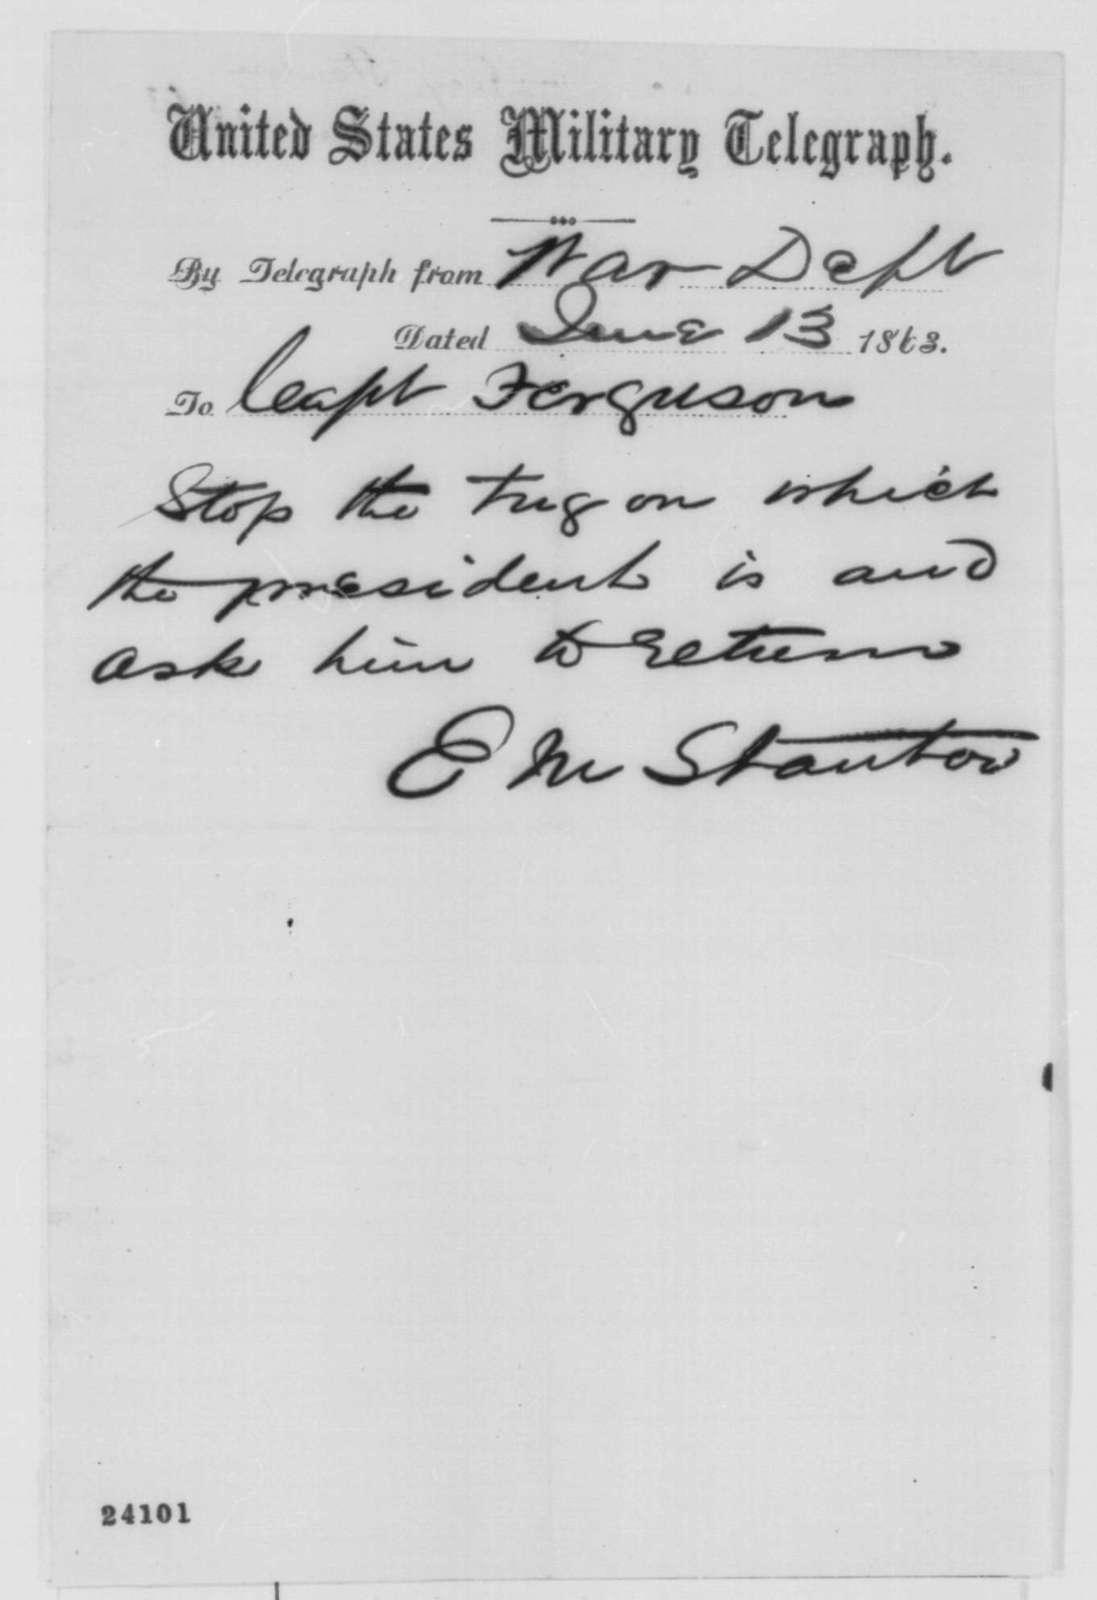 Edwin M. Stanton to Colin B. Ferguson, Saturday, June 13, 1863  (Telegram ordering return of boat Lincoln is traveling on)